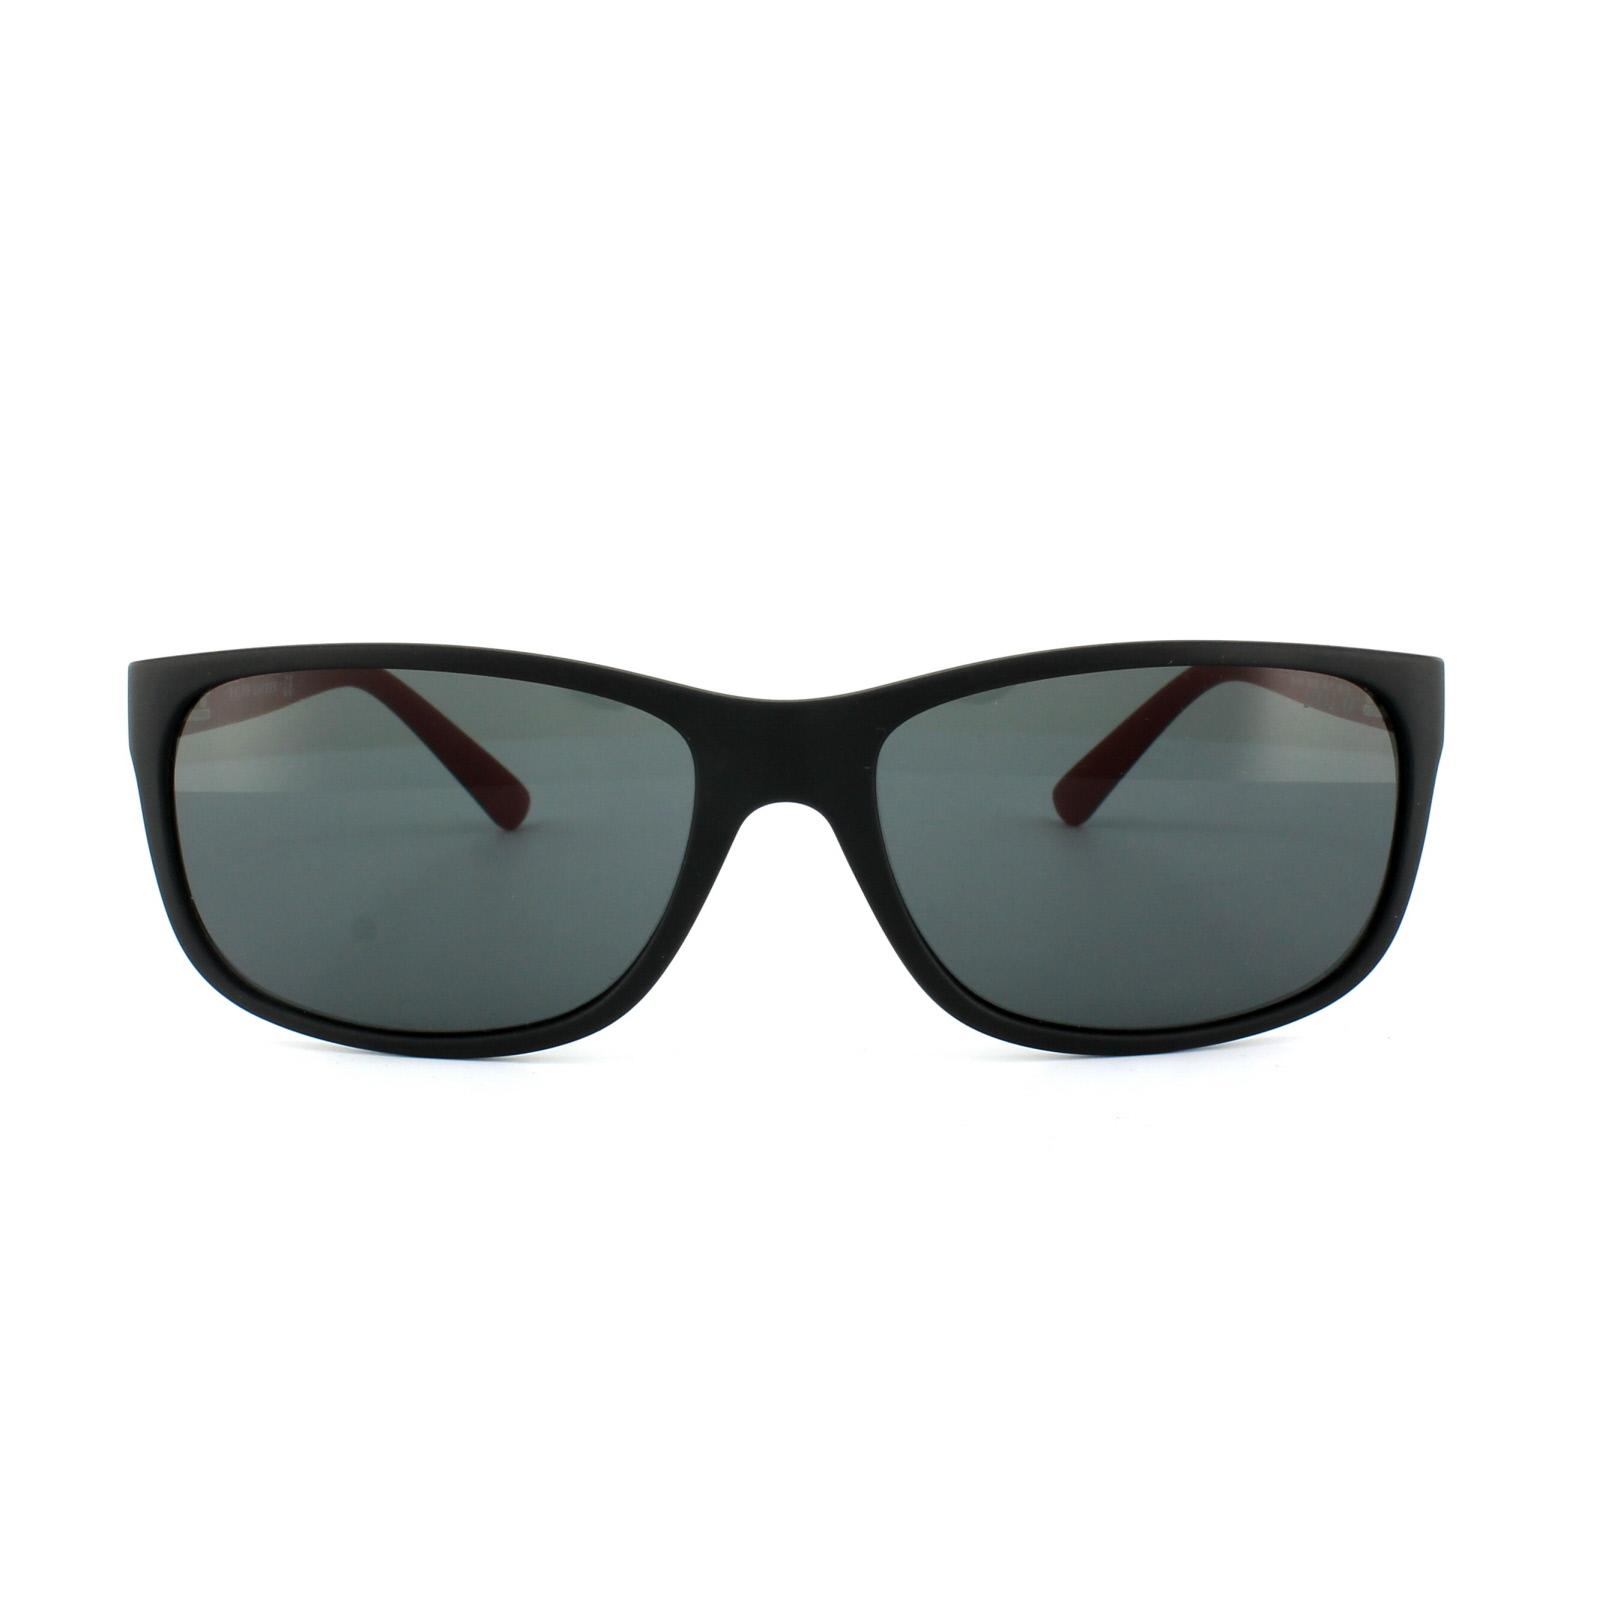 ... Polo Ralph Lauren 4109 Sunglasses Thumbnail 2 ...